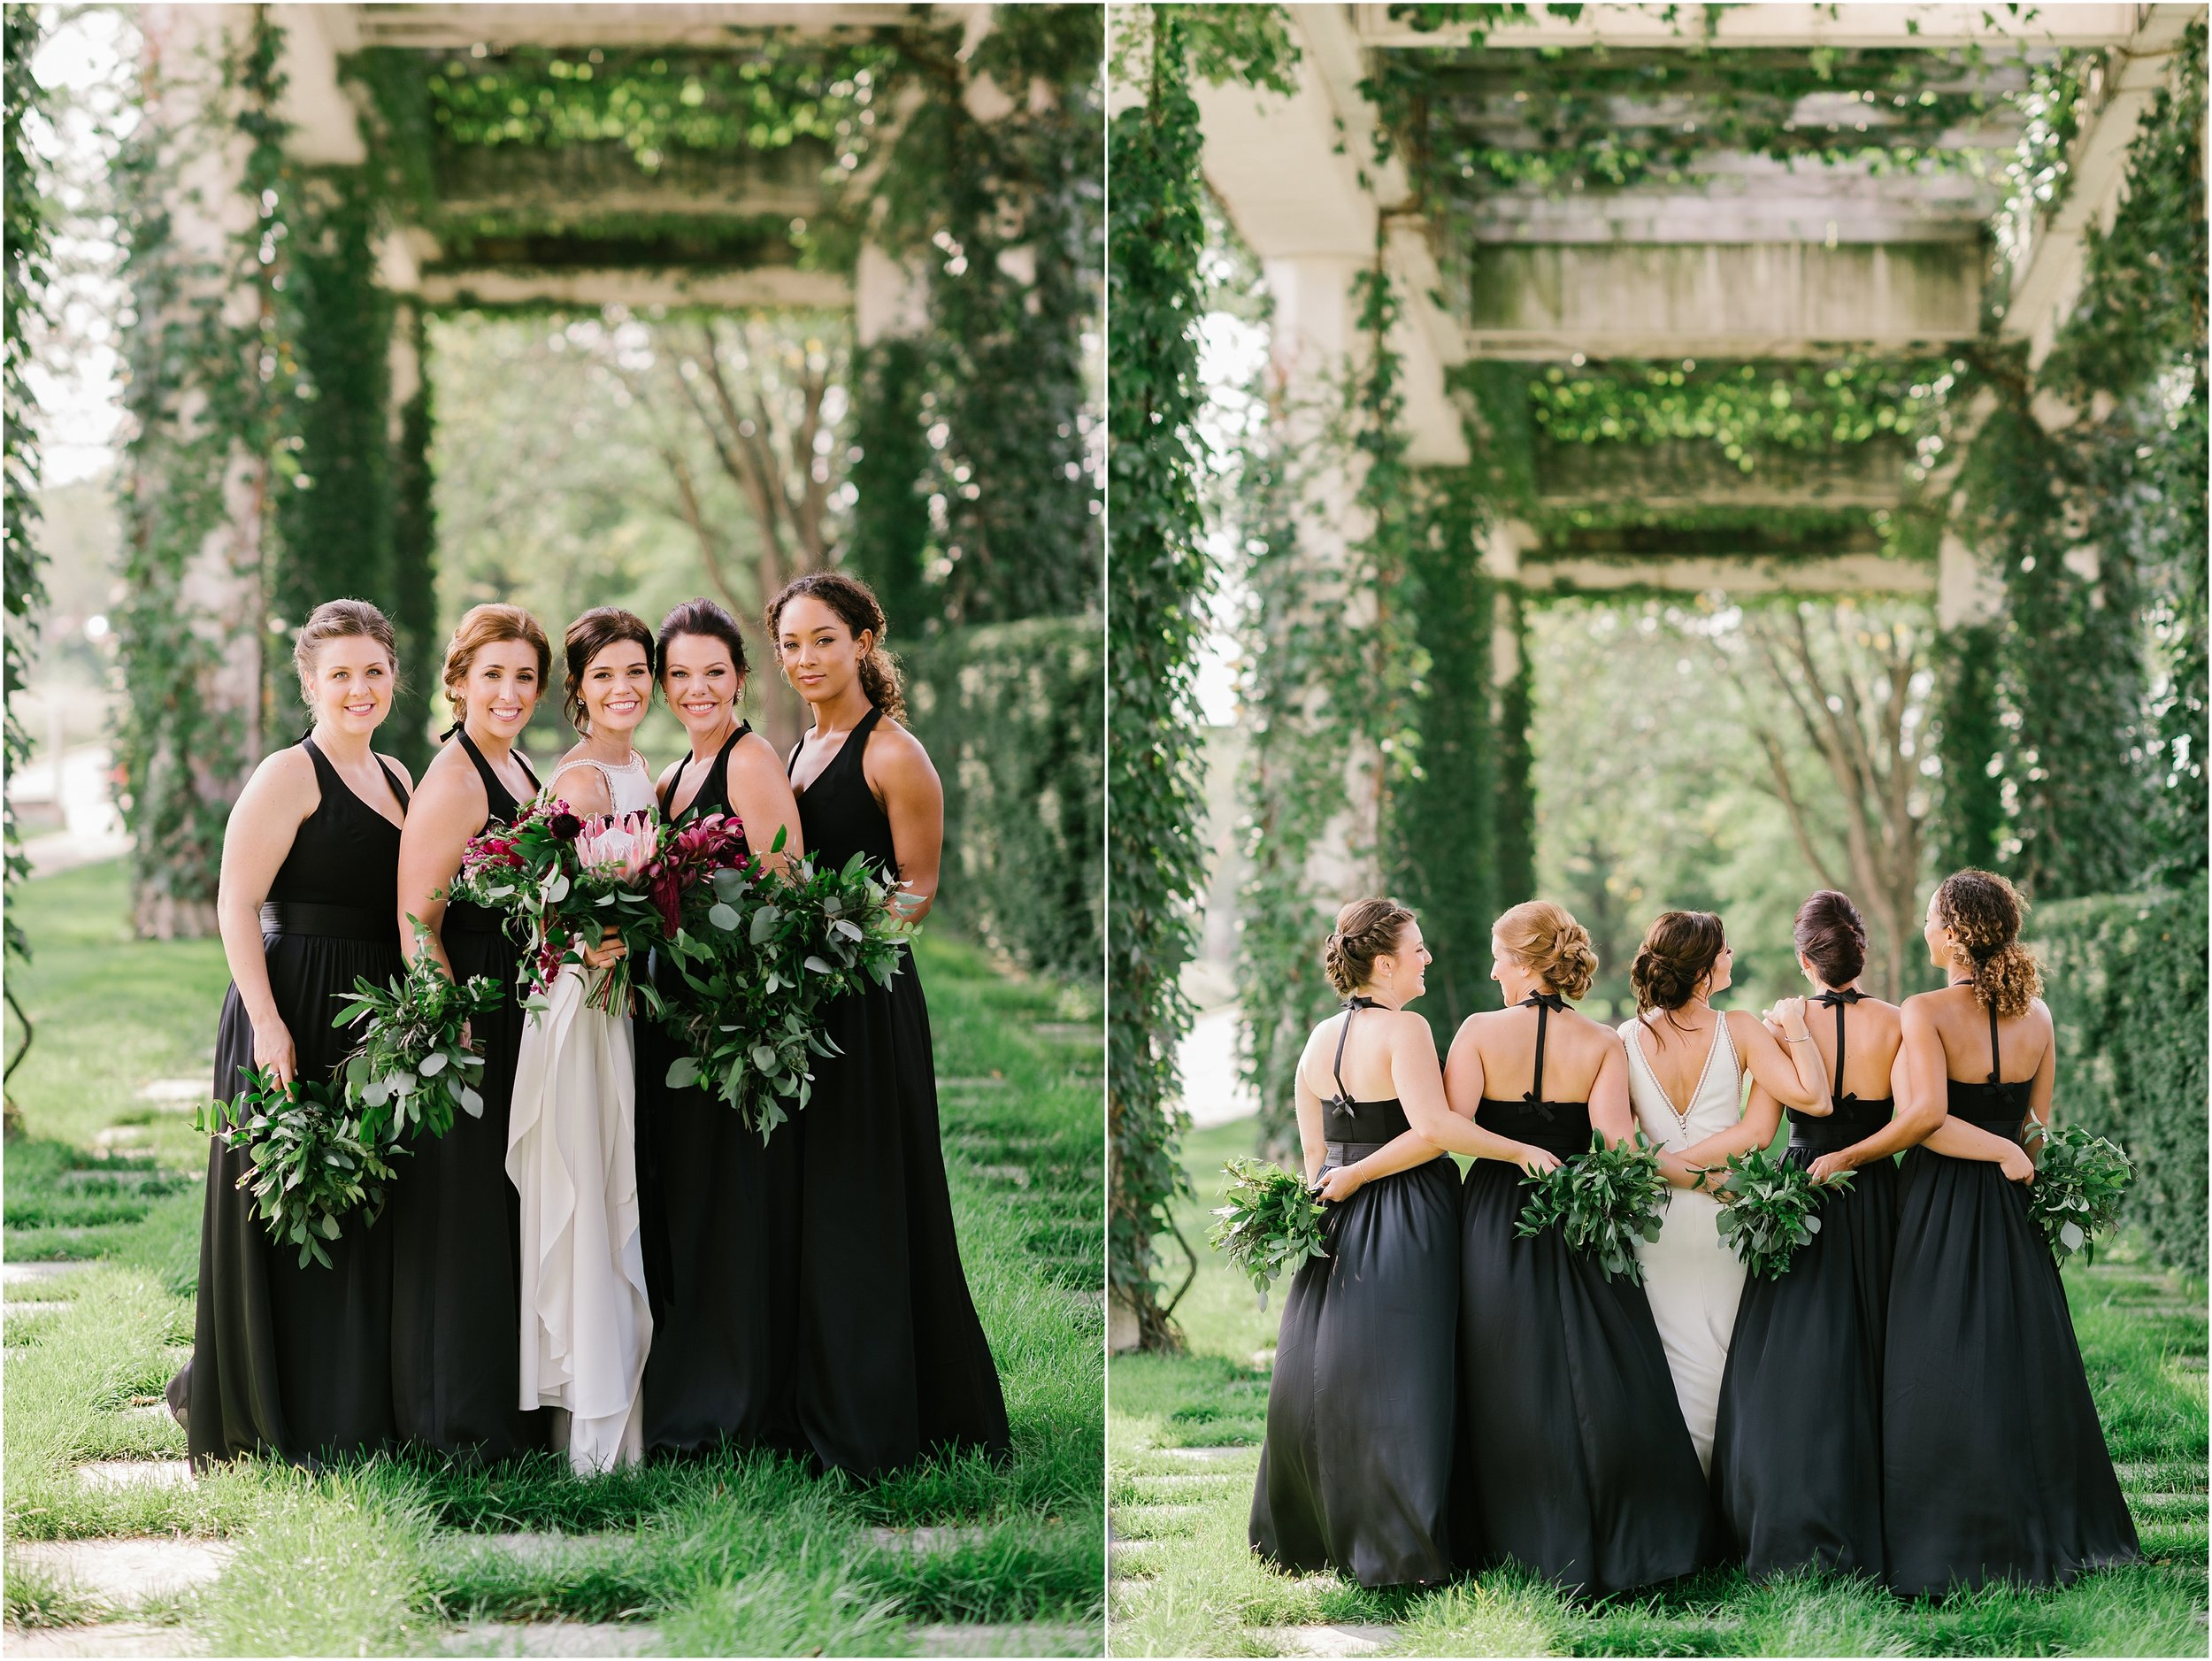 Rebecca_Shehorn_Photography_Indianapolis Wedding Photographer Sycamore at Mallow Run Wedding_9739.jpg